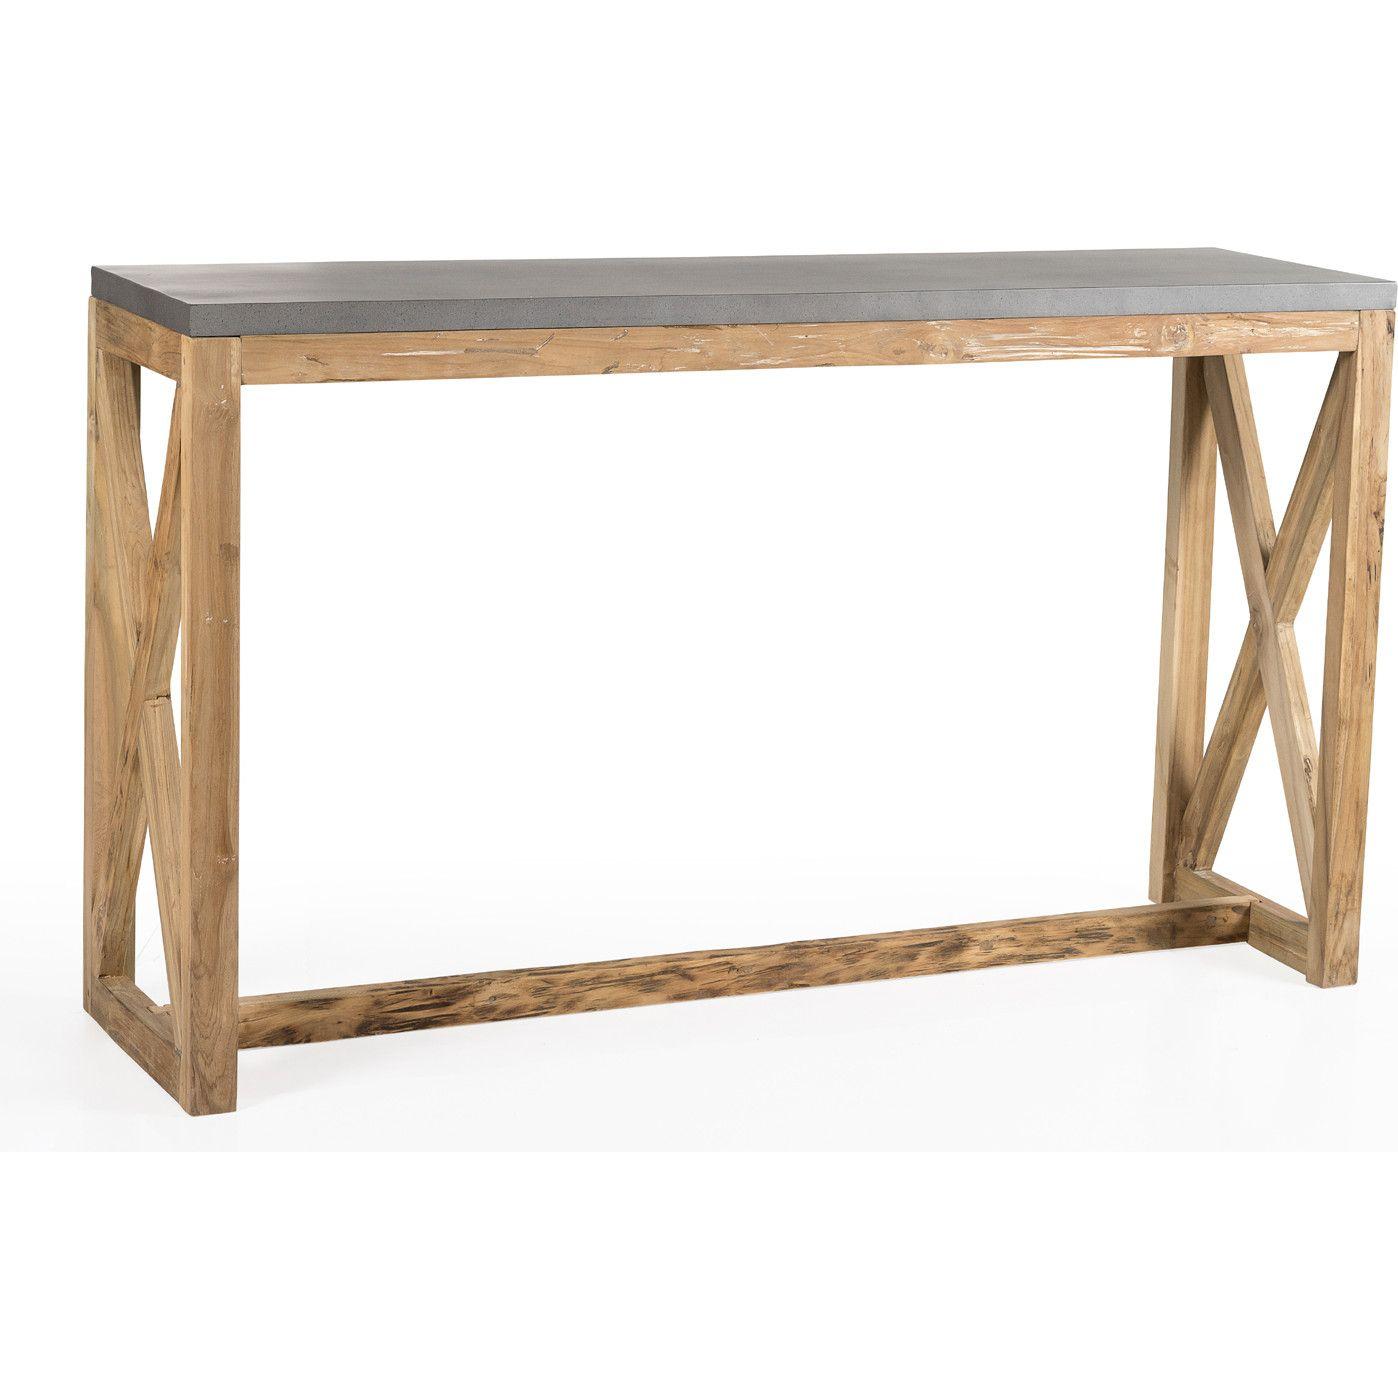 Surprising Padmas Plantation Valencia Console Table Metal Recycled Inzonedesignstudio Interior Chair Design Inzonedesignstudiocom